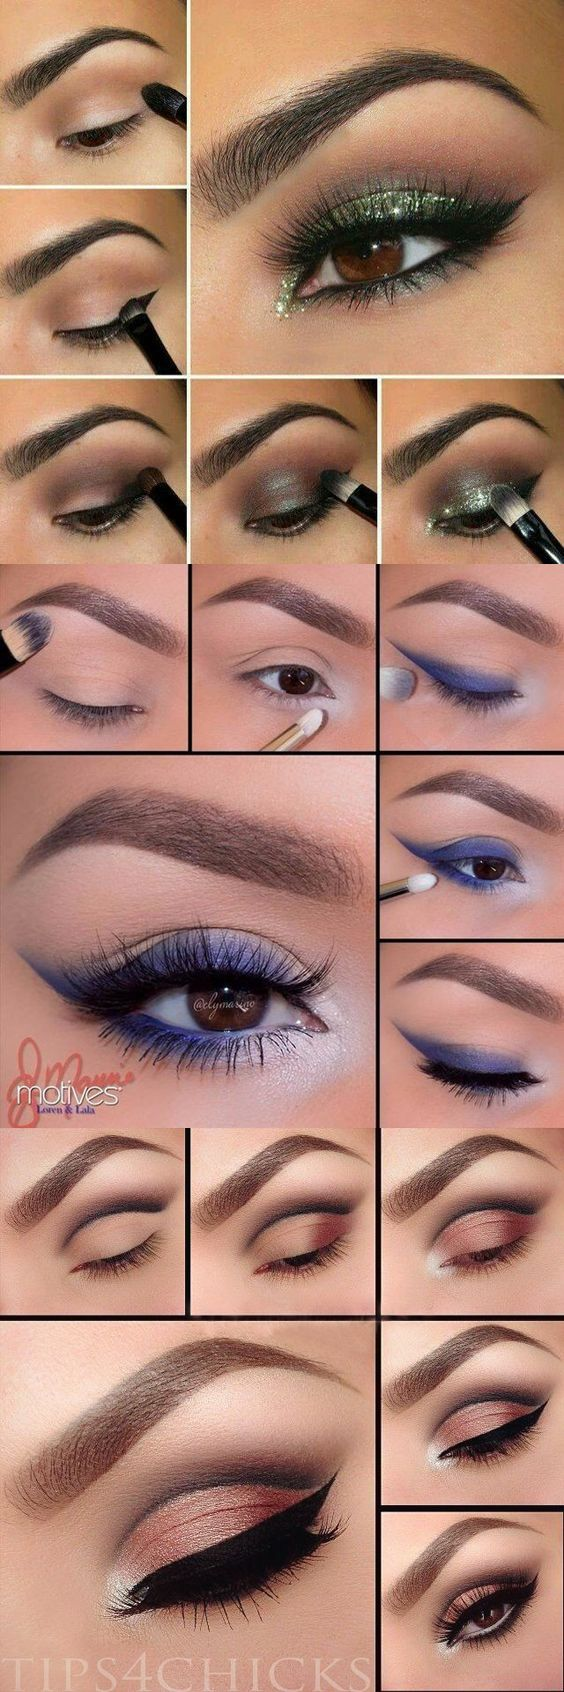 Beginner Makeup Brushes: Best 25+ Beginner Makeup Ideas On Pinterest